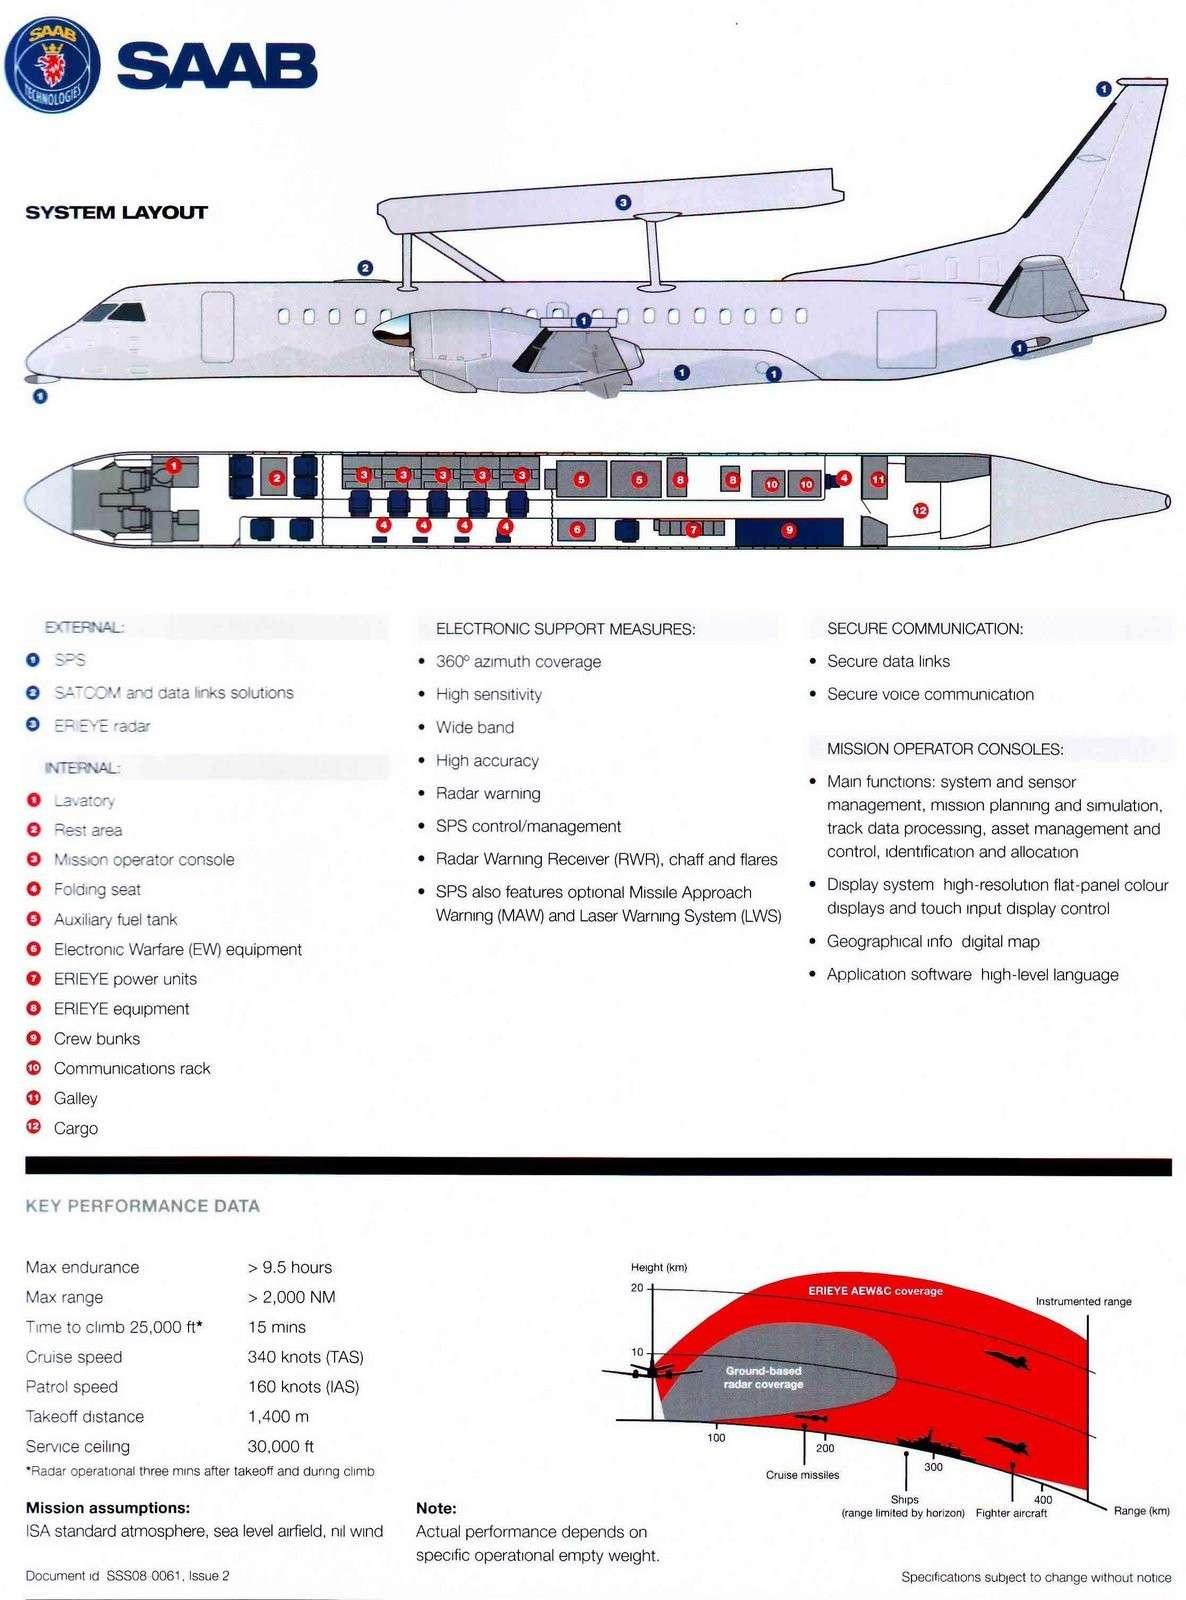 Avions AEW&C Saab_211